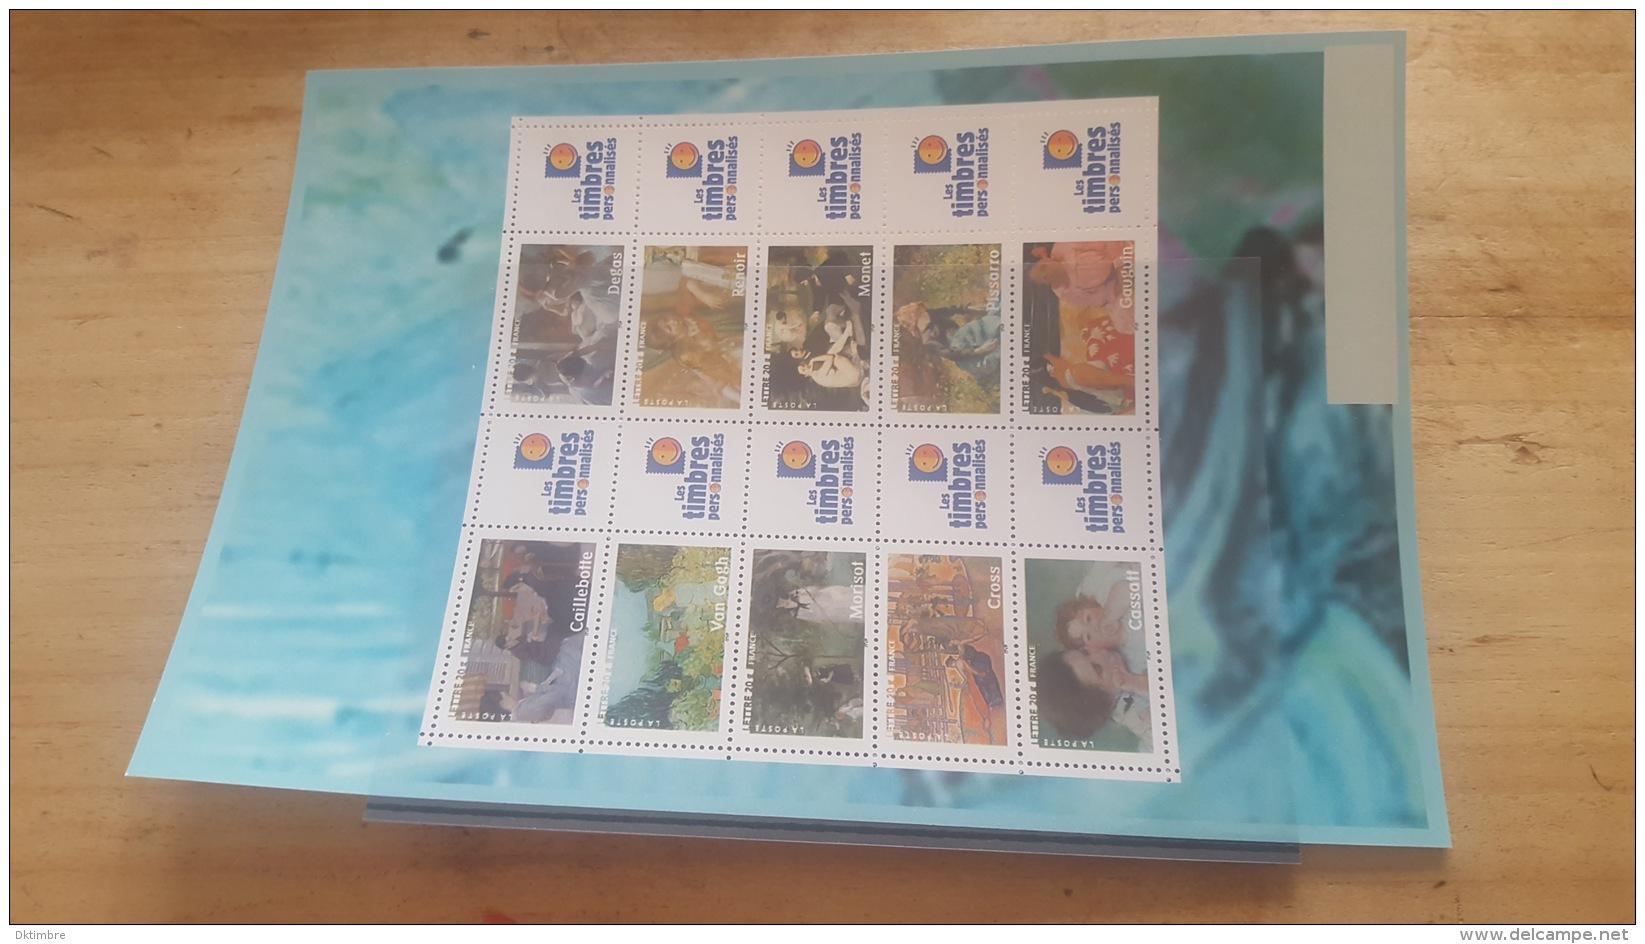 LOT 366576 TIMBRE DE FRANCE NEUF** LUXE BLOC - Blocs & Feuillets